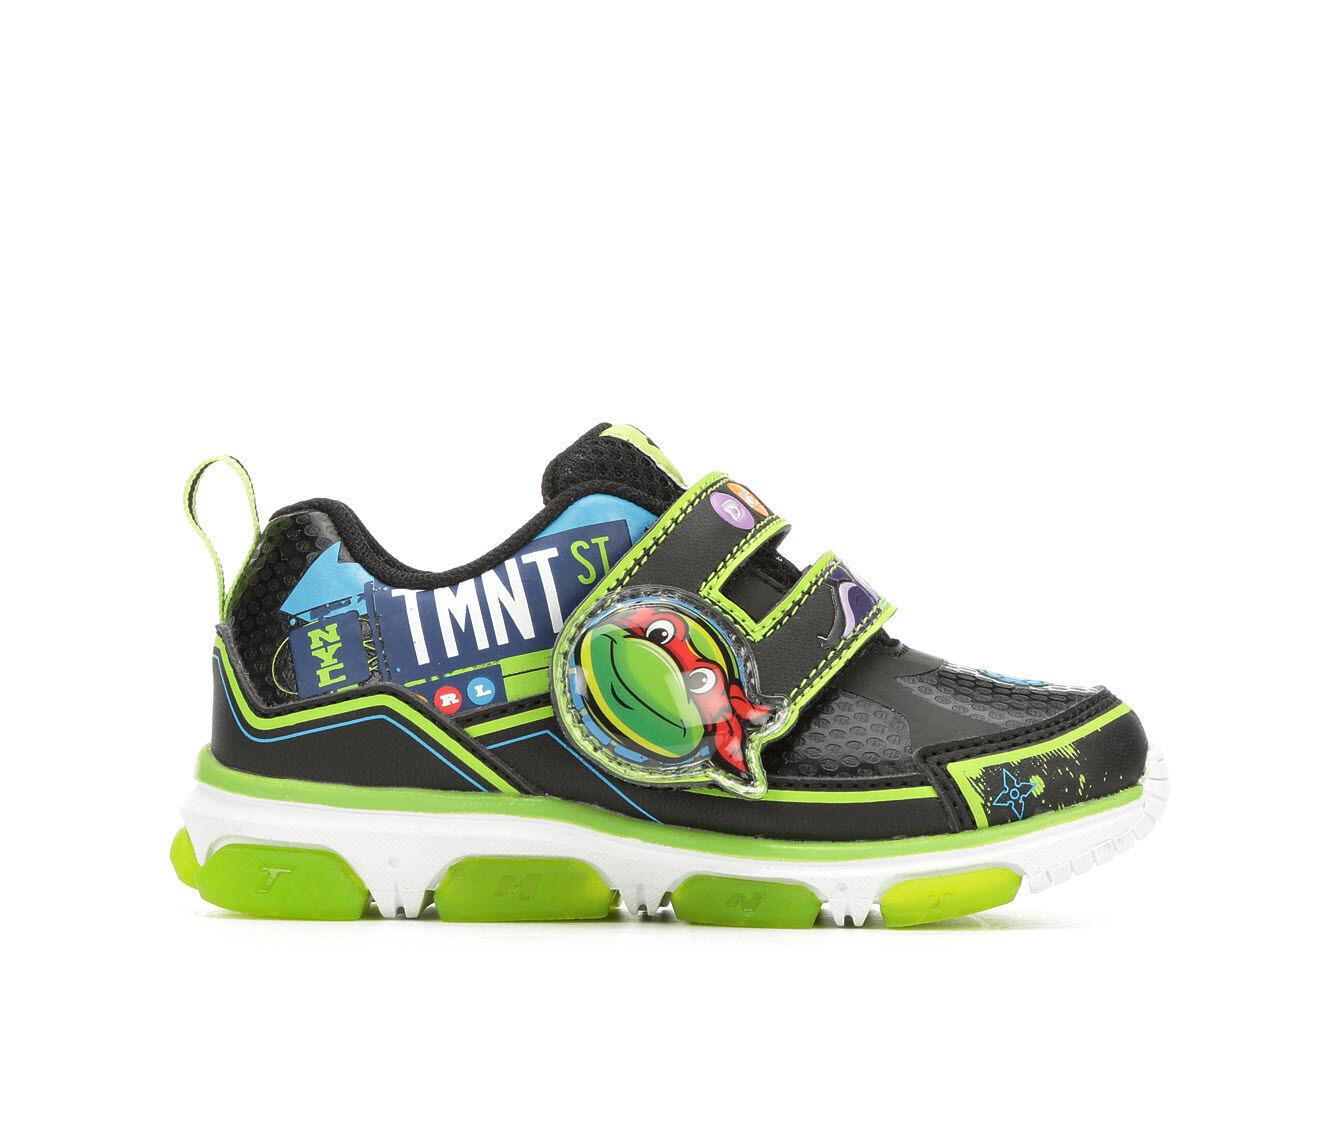 Boys' Nickelodeon Toddler & Little Kid TMNT 7 Light Up Sneakers